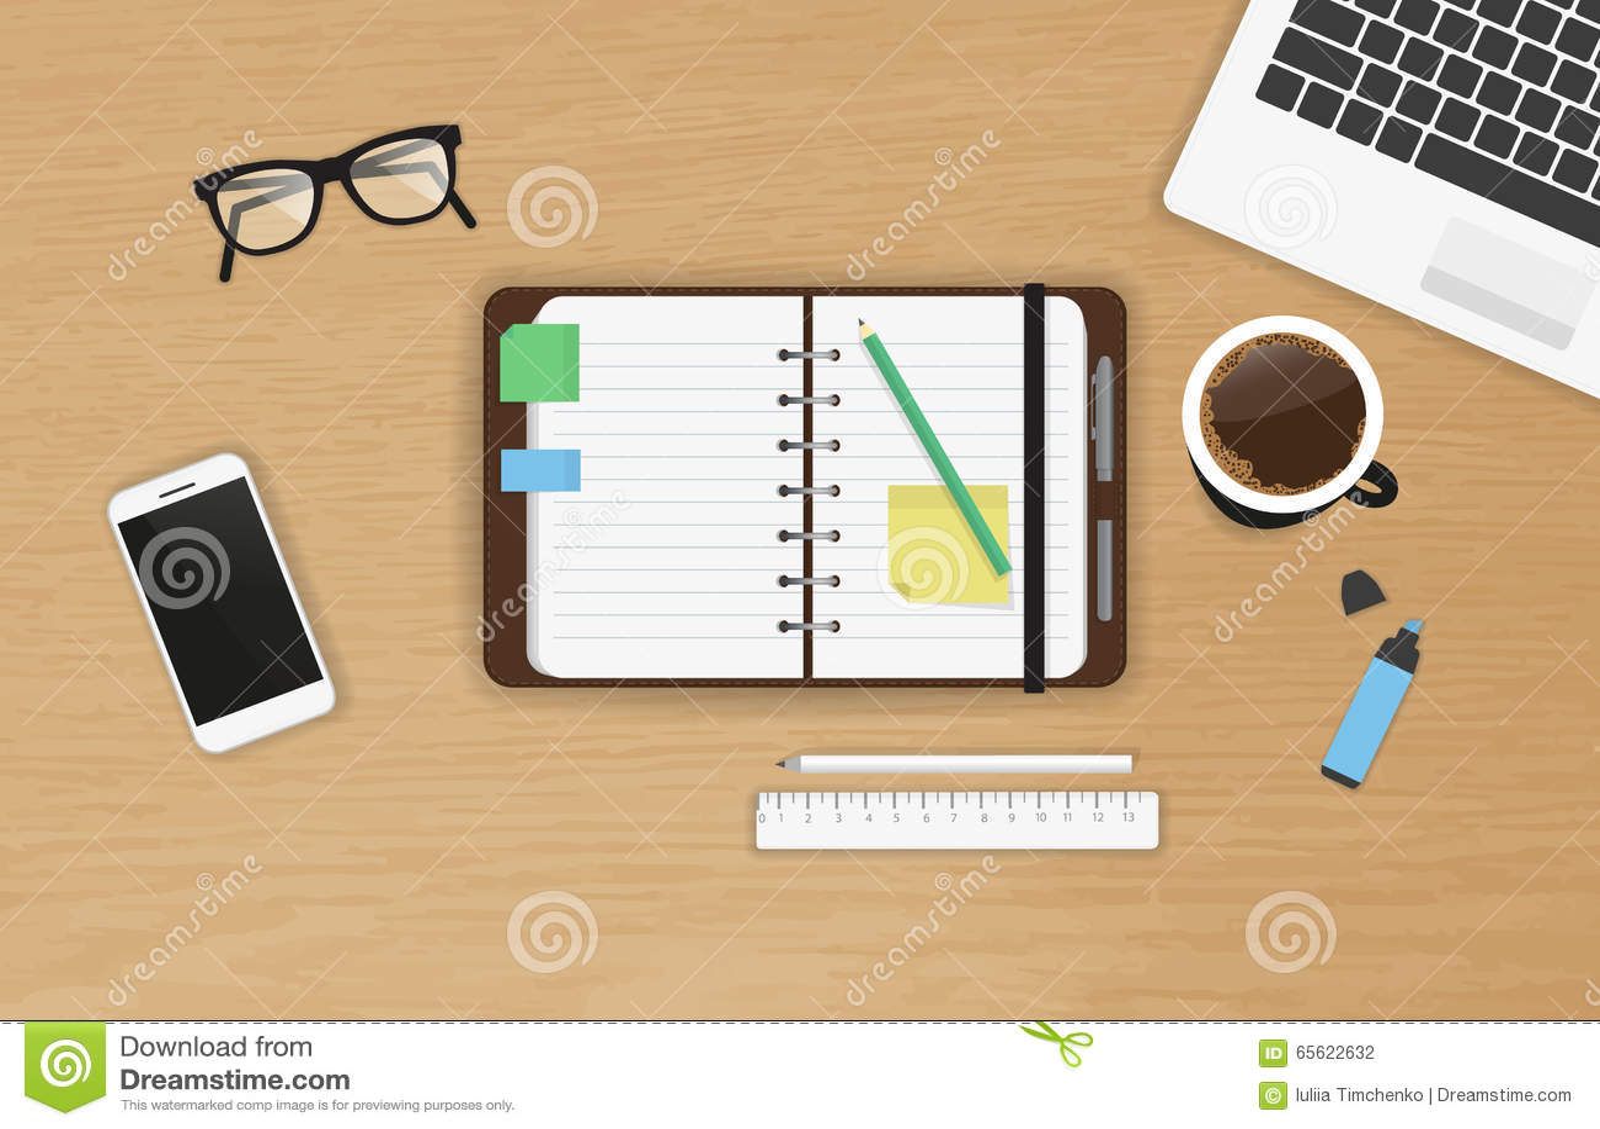 realistic work desk organization top view stock vector